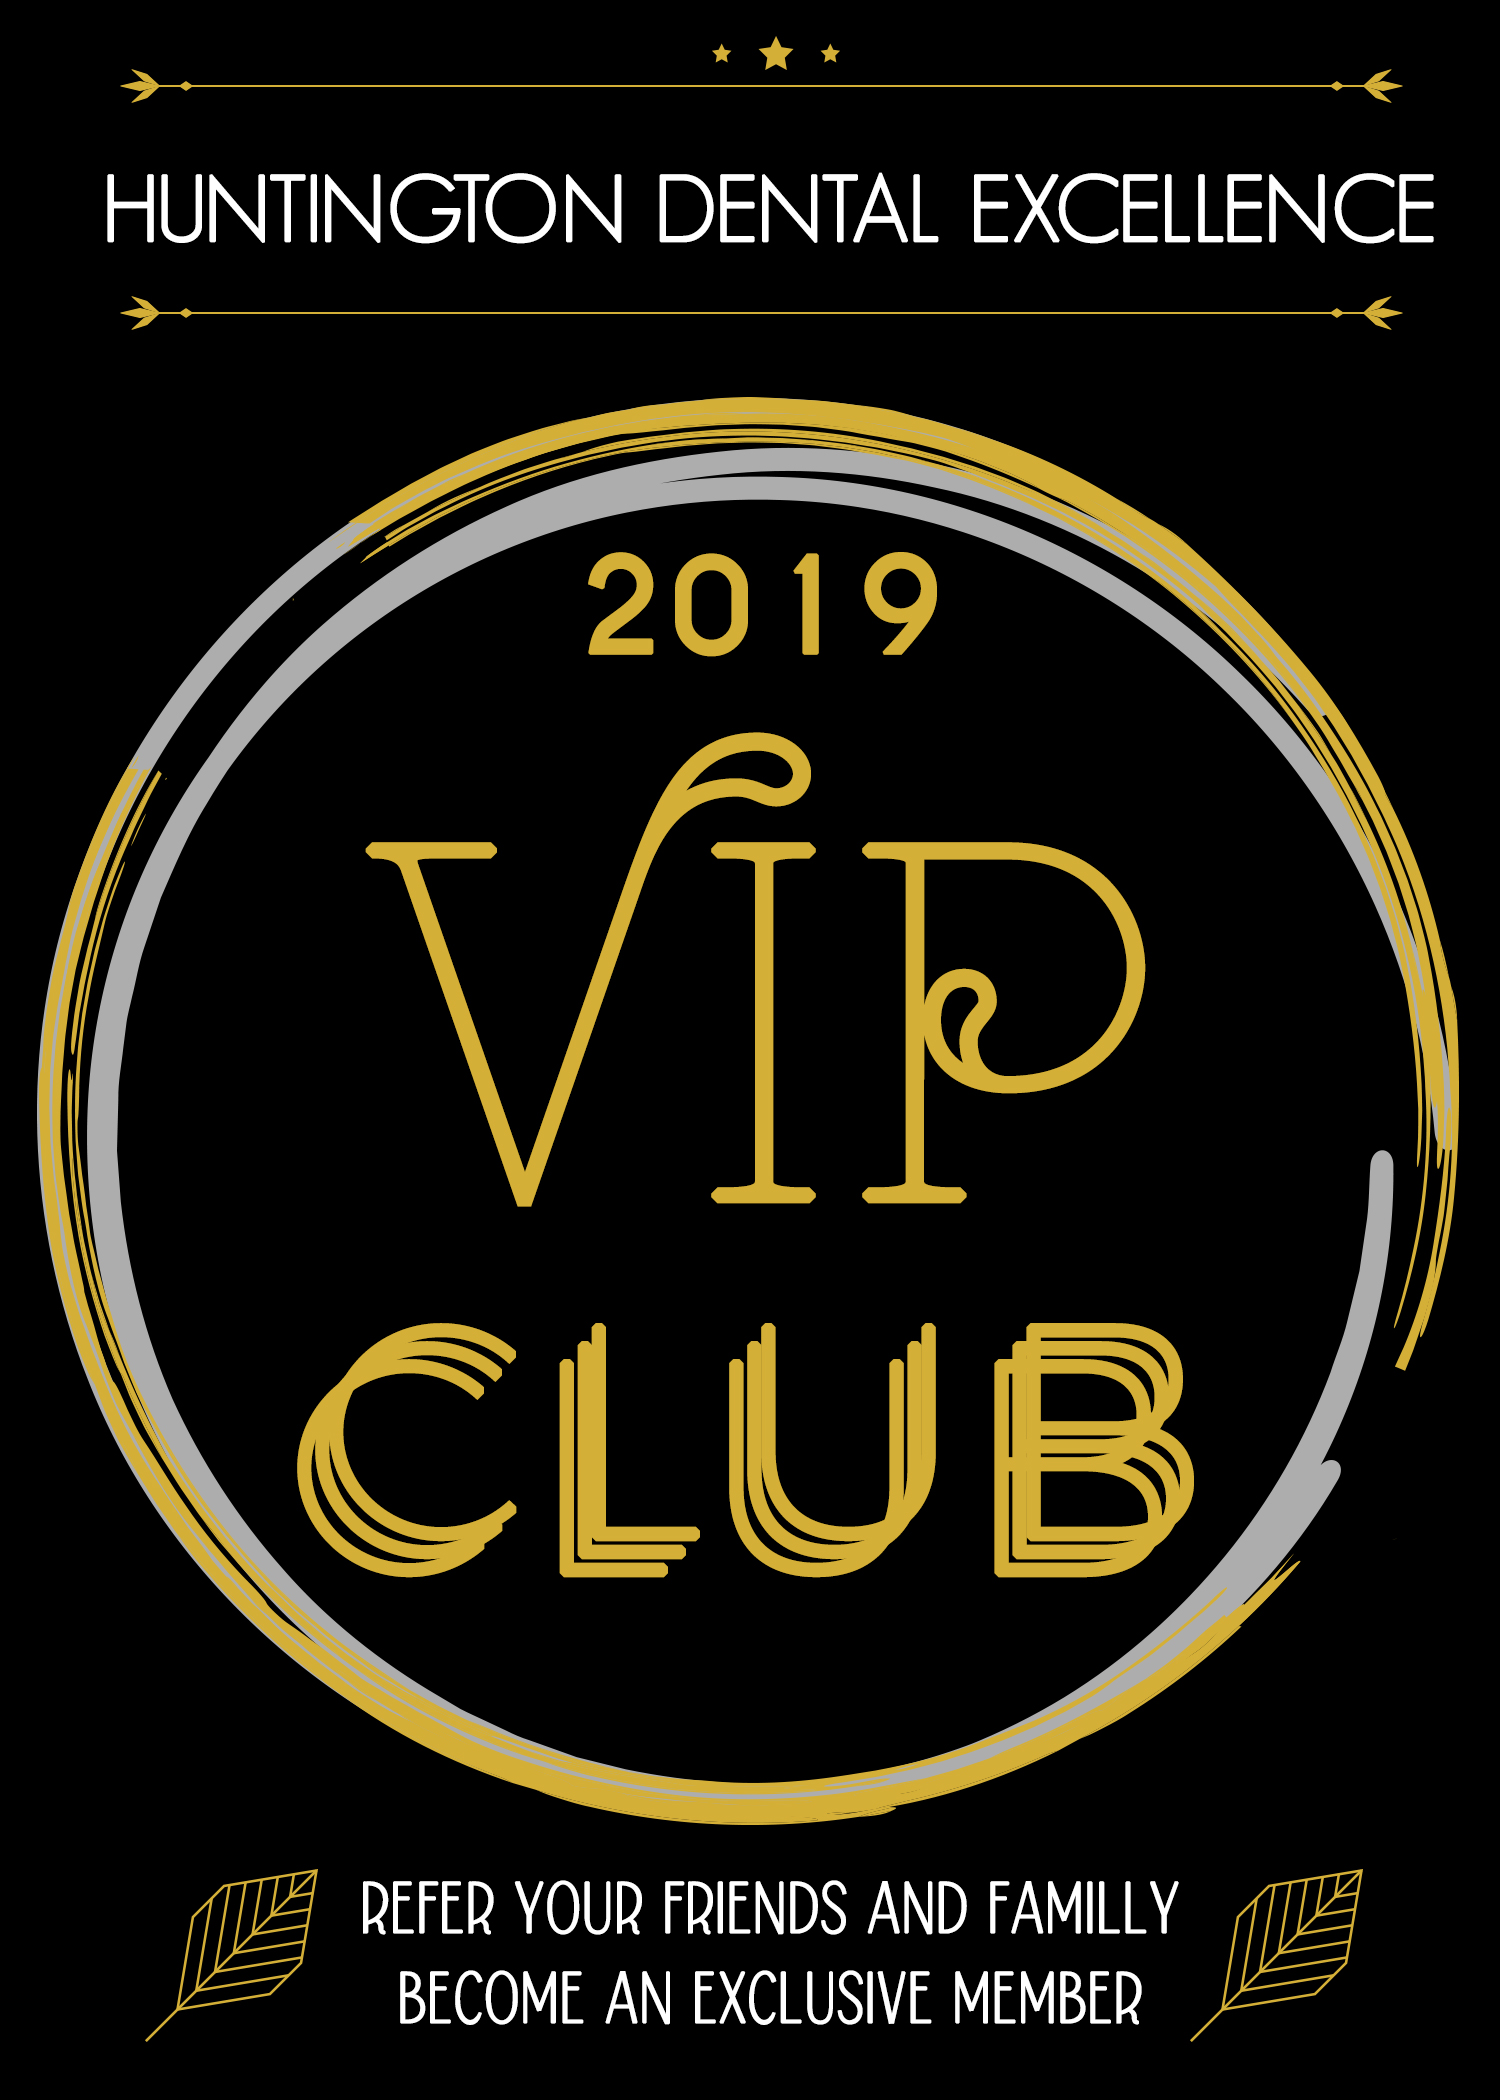 Huntington-Dental-Excellence-VIP-Club.jpg